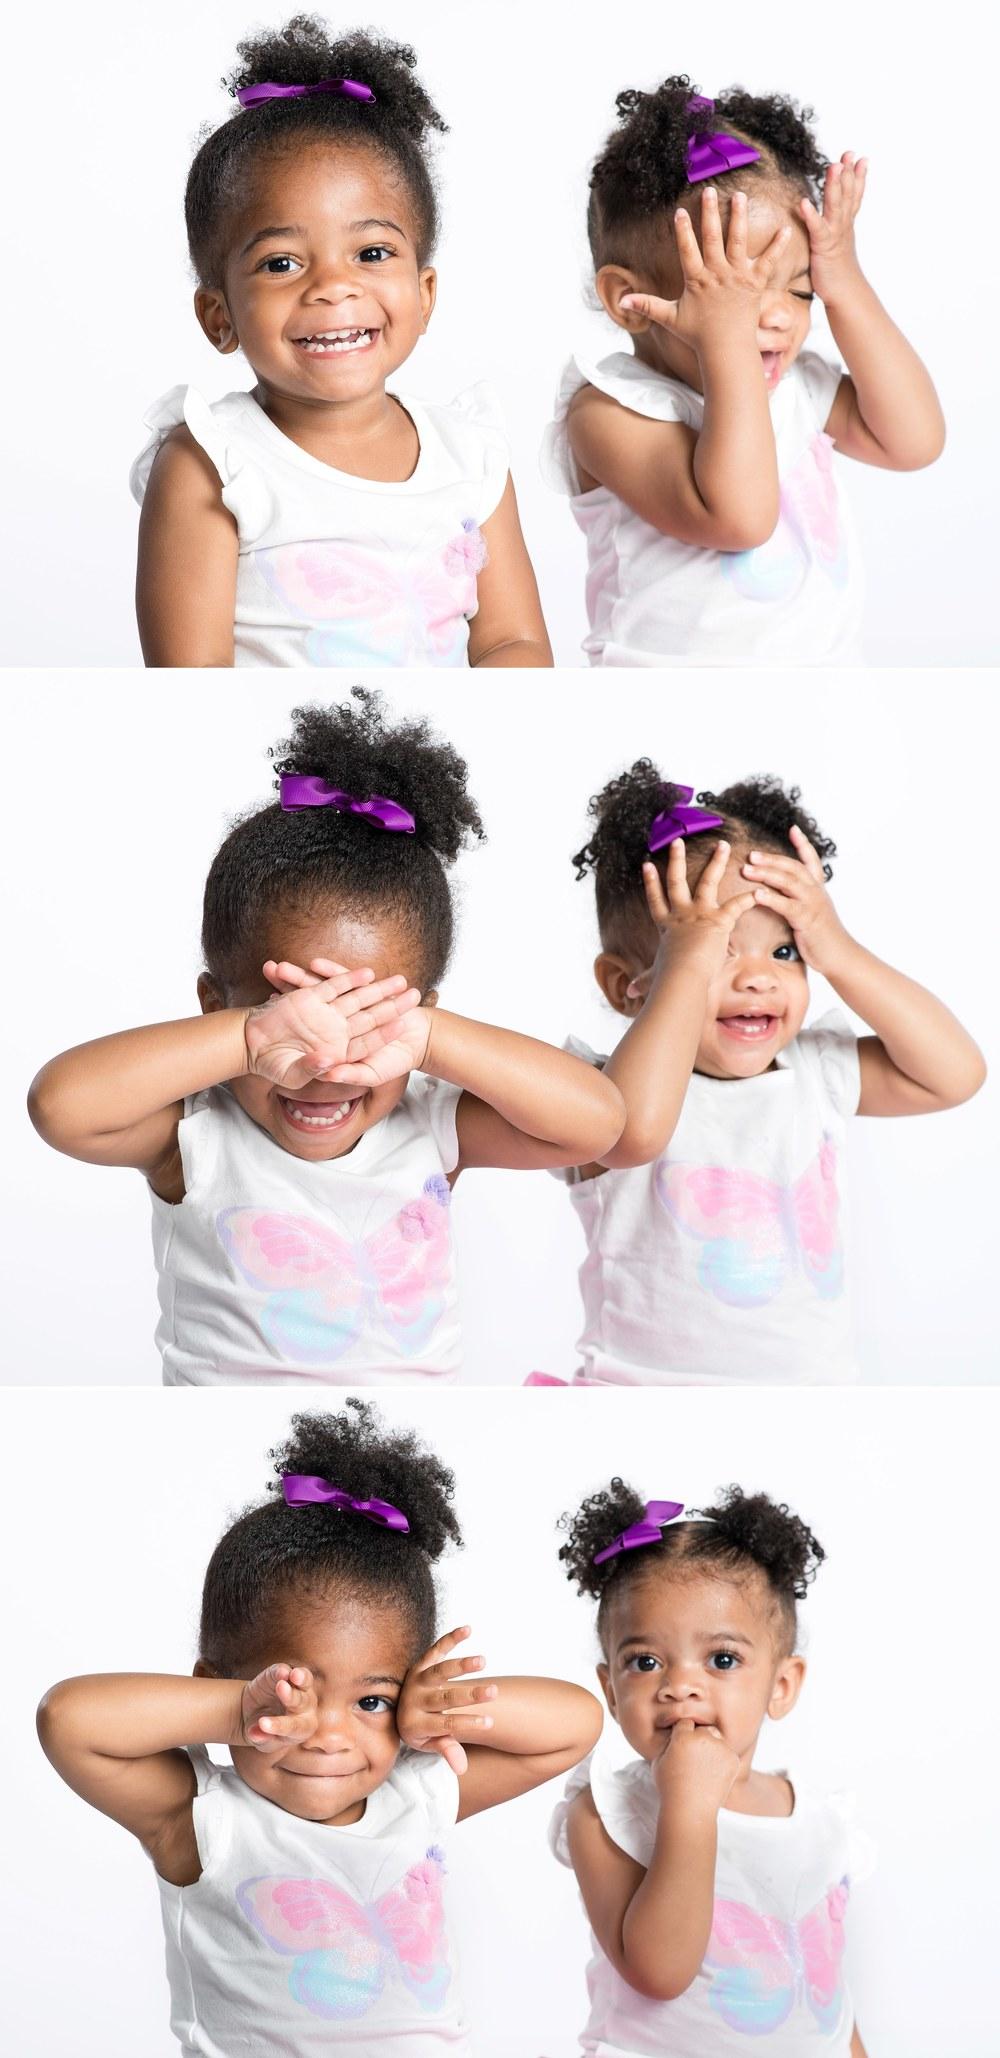 St-Augustine-Photographer-Kids-Studio-Portraits_0003.jpg